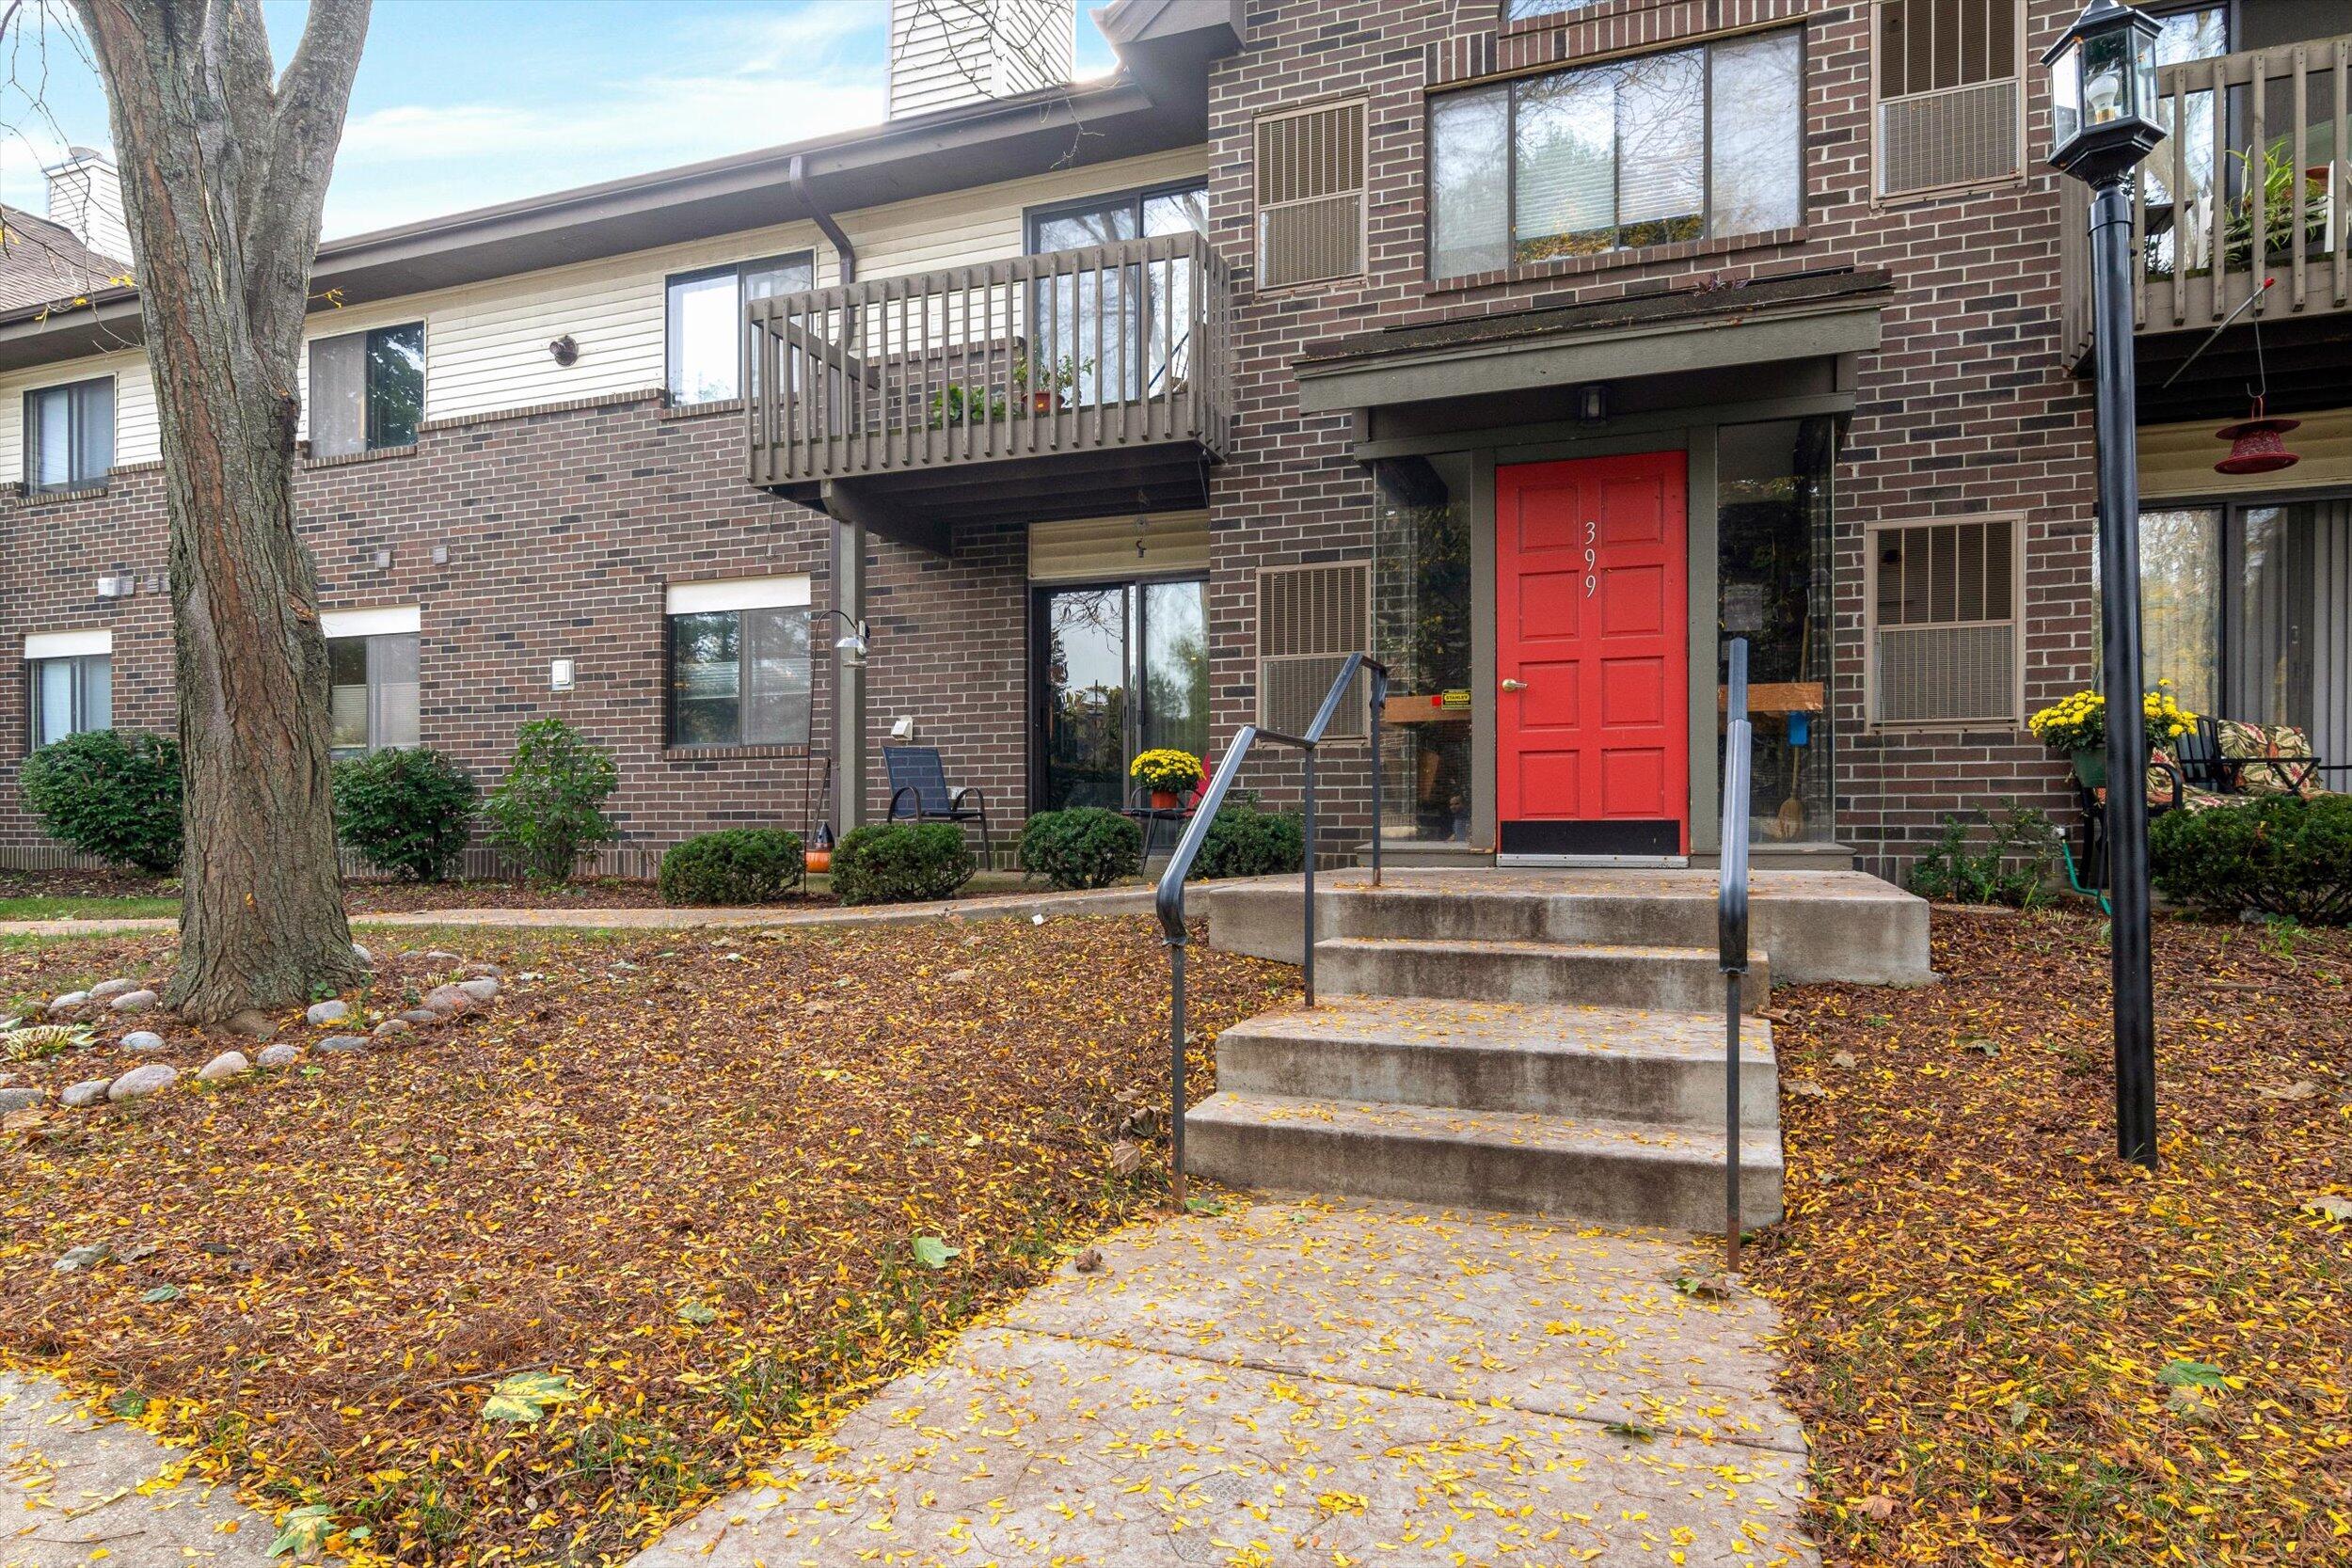 399 Main St, Thiensville, Wisconsin 53092, 2 Bedrooms Bedrooms, 6 Rooms Rooms,2 BathroomsBathrooms,Condominiums,For Sale,Main St,2,1767916